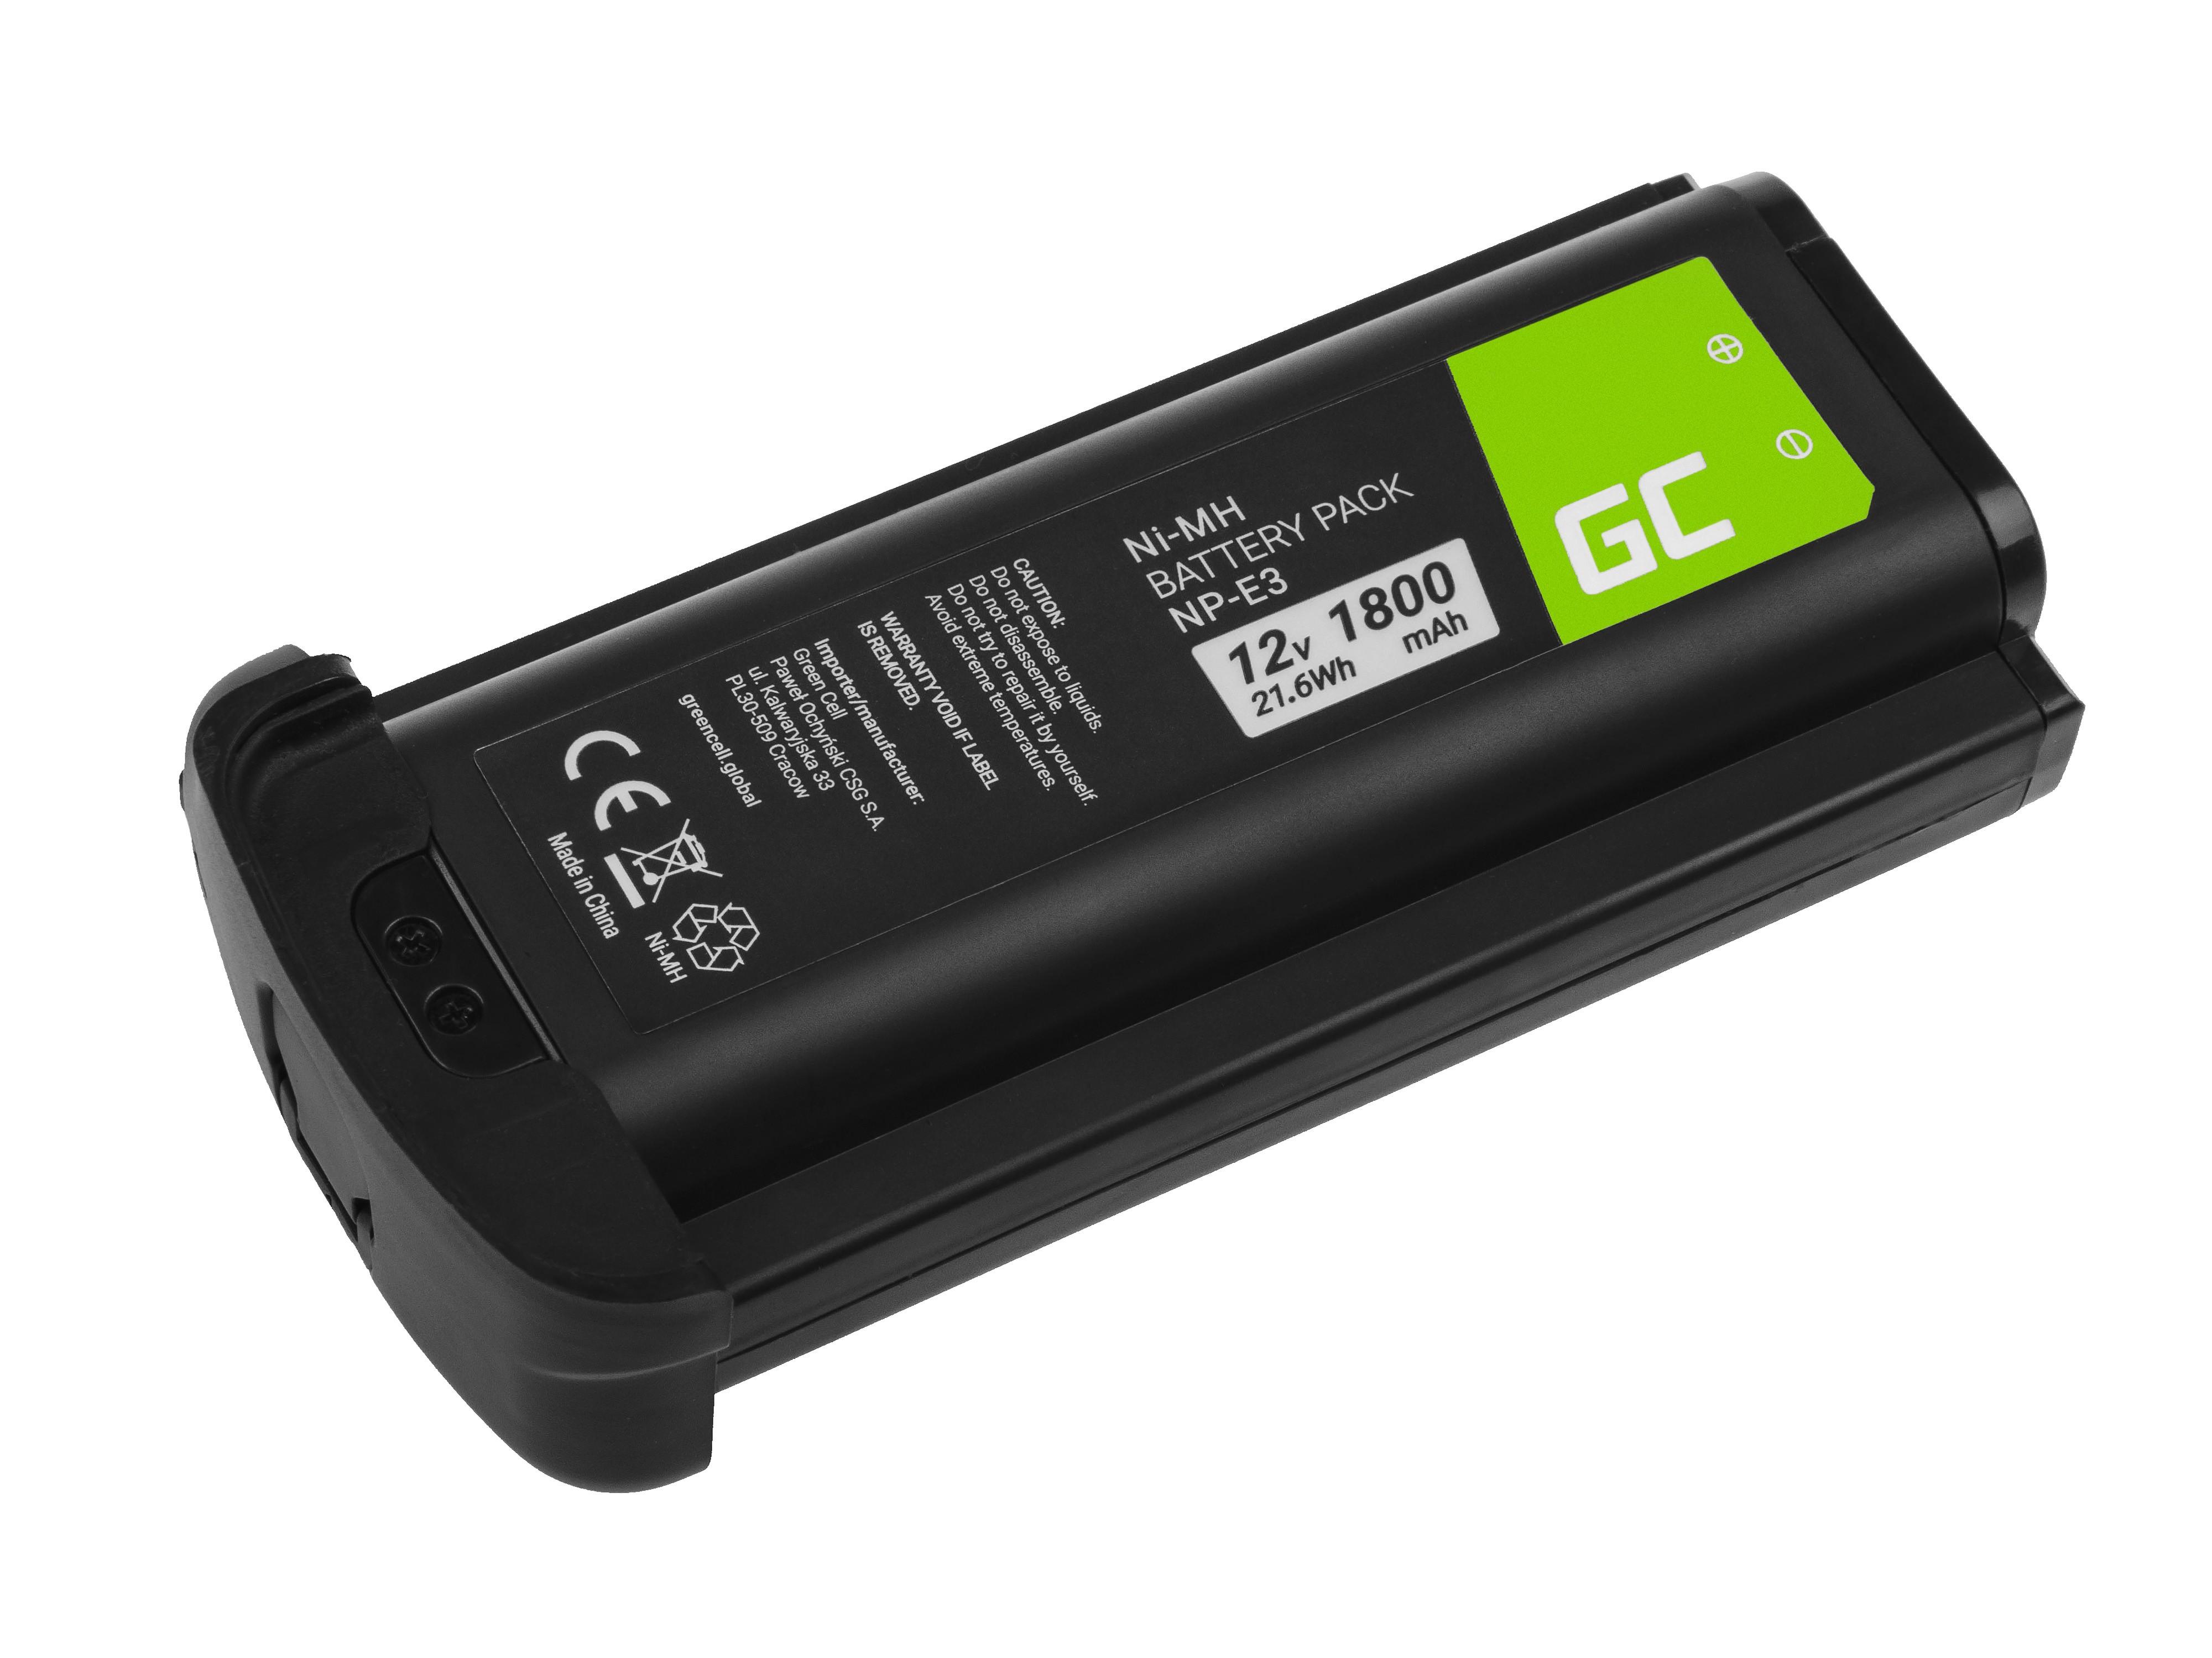 Batteri NP-E3 NPE3 do Canon EOS-1D Mark II, Canon EOS-1Ds Mark II 12V 1800mAh